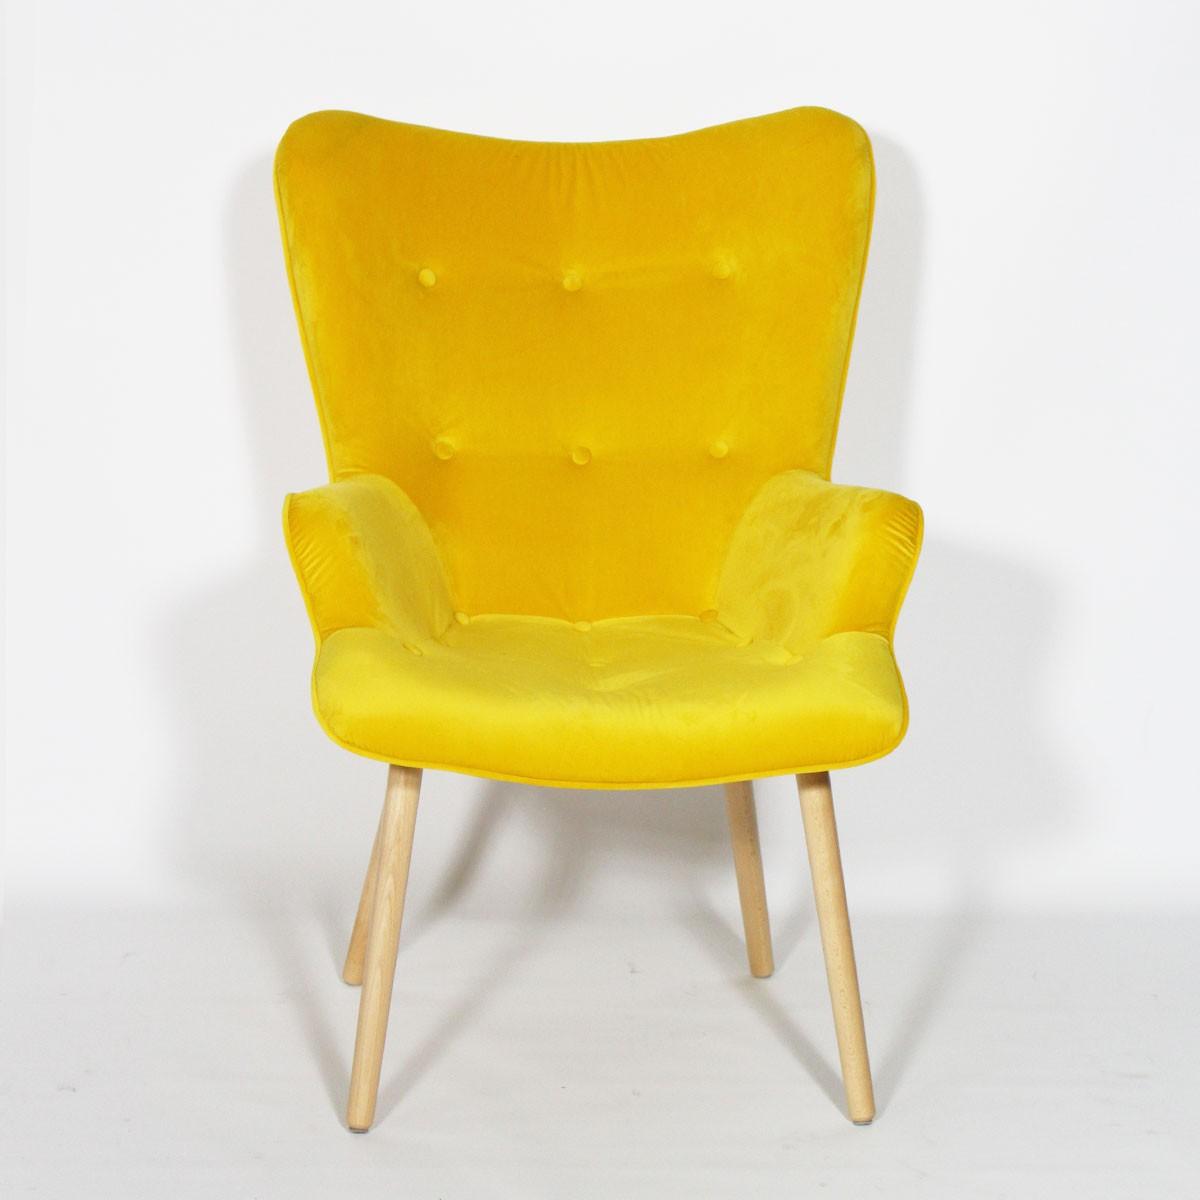 fauteuil bureau jaune le coin gamer. Black Bedroom Furniture Sets. Home Design Ideas